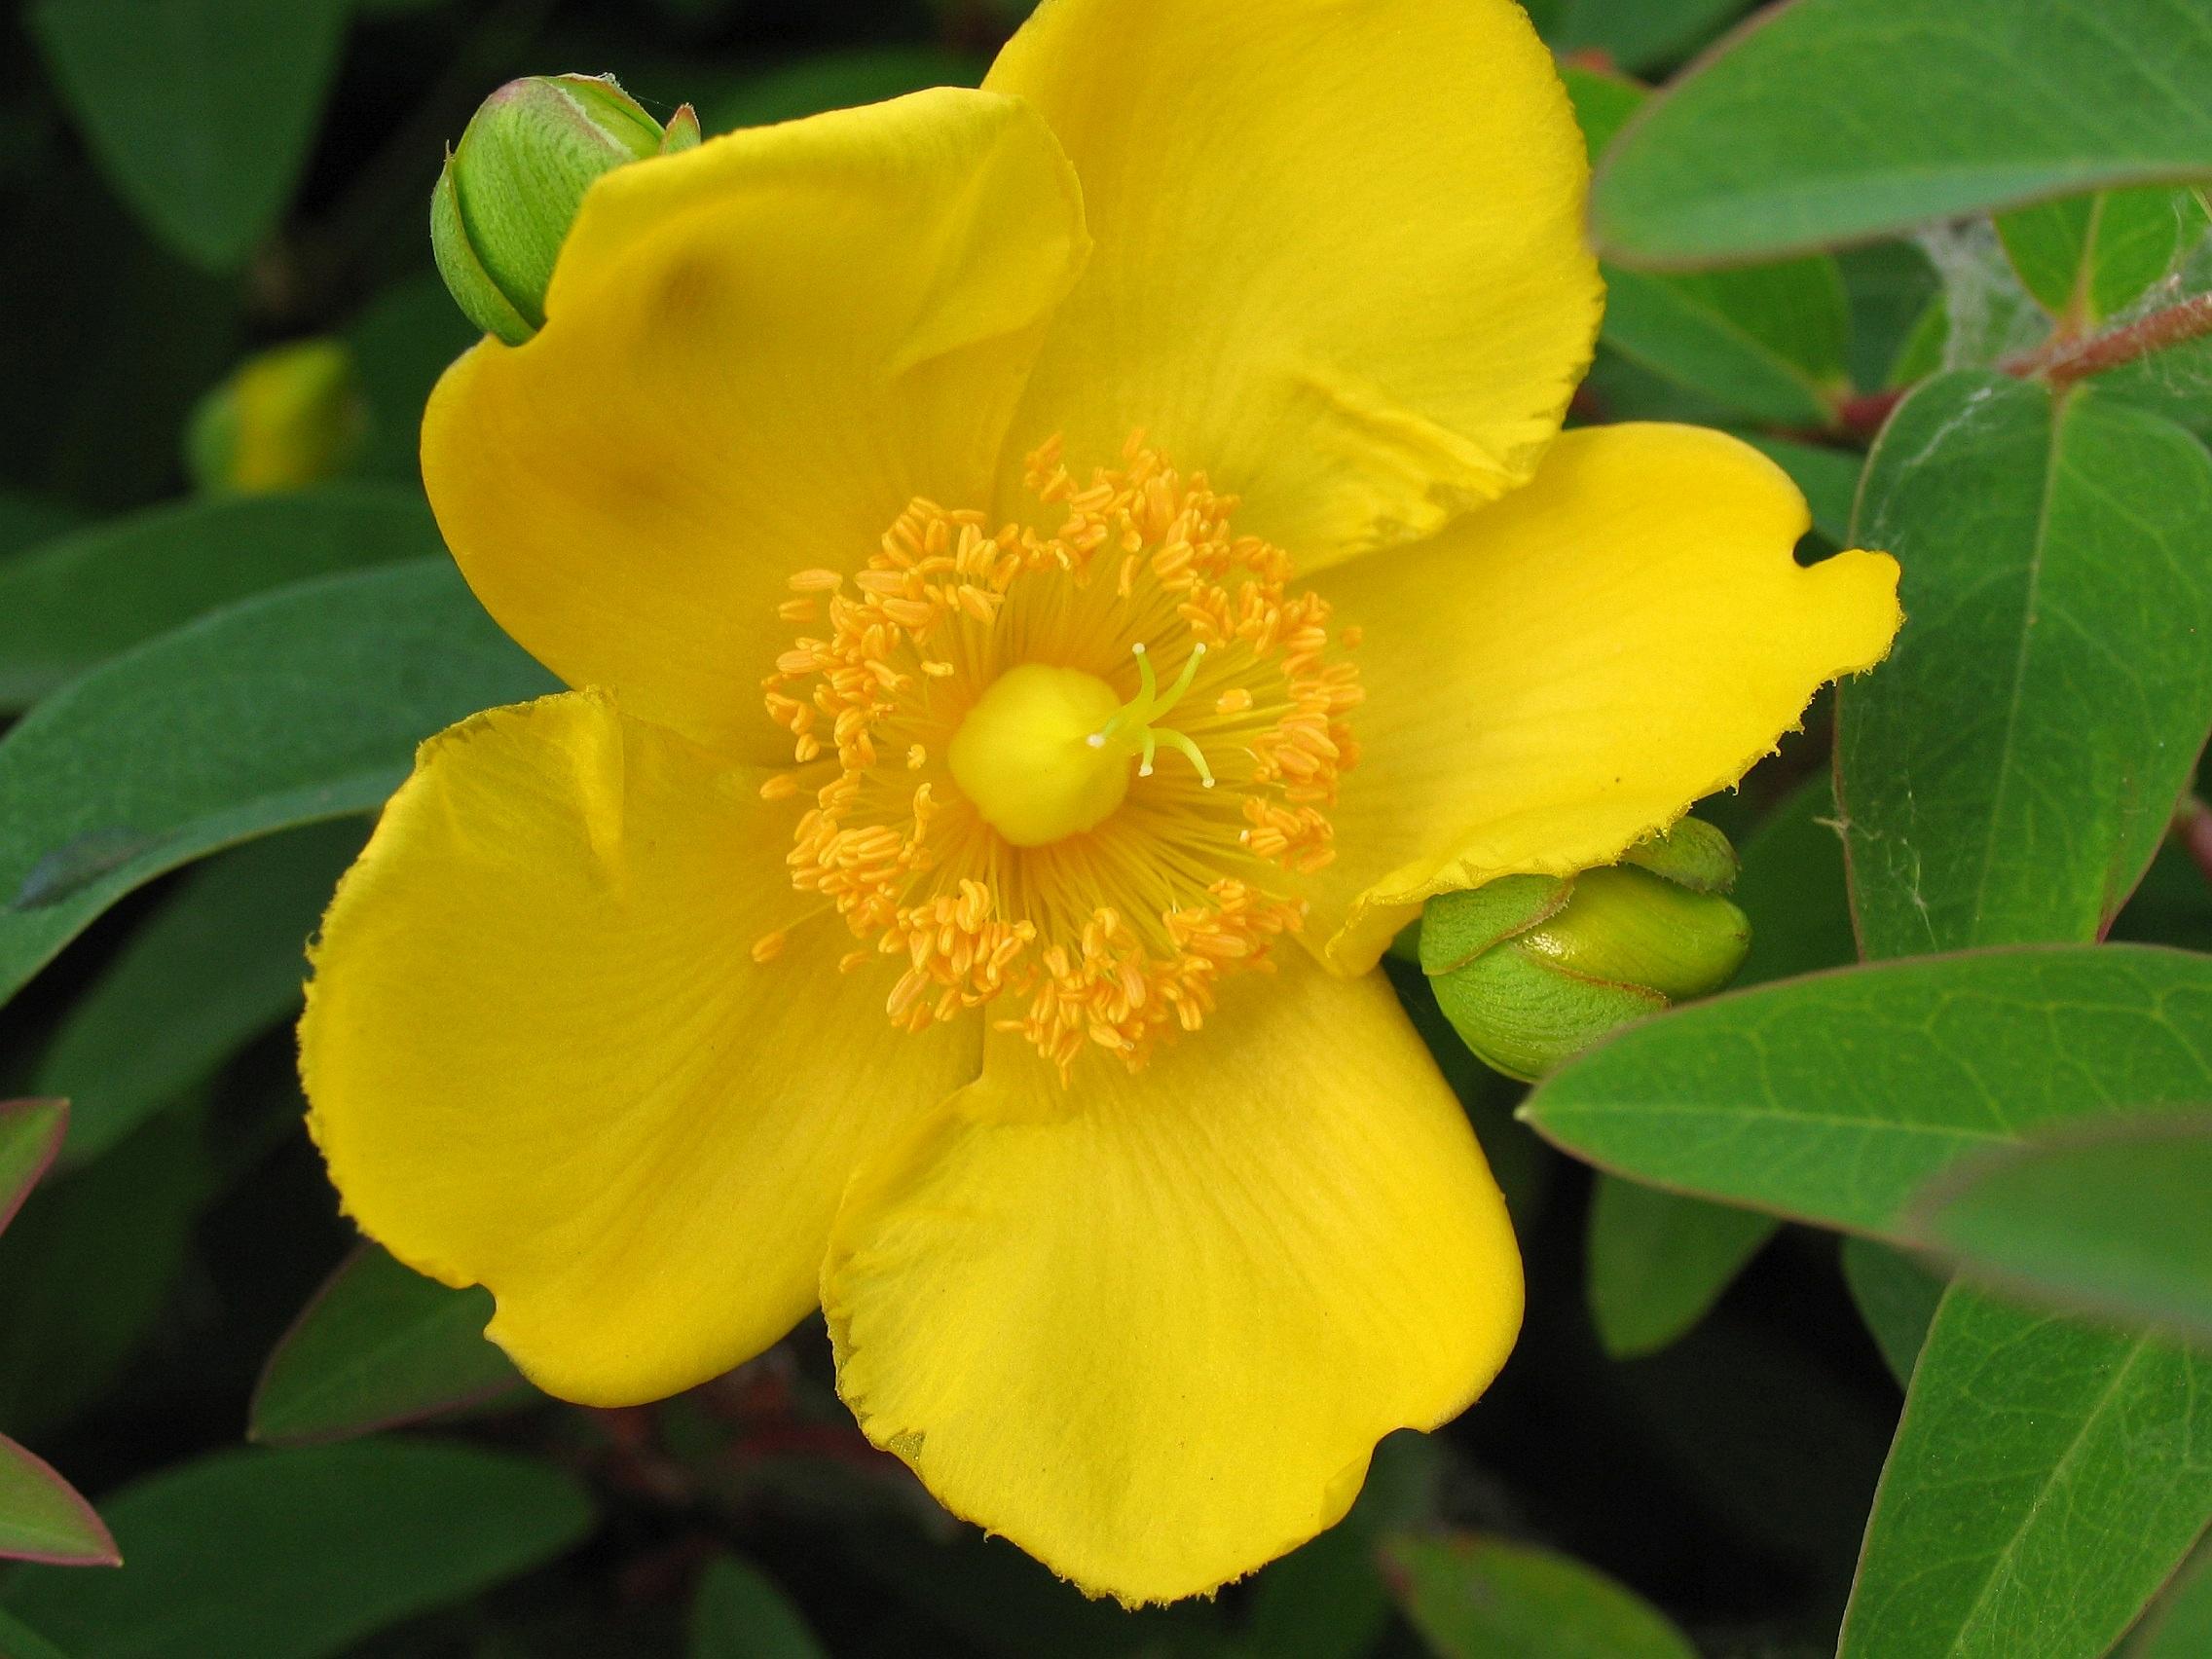 Free Images Nature Petal Produce Botany Flora Yellow Flower